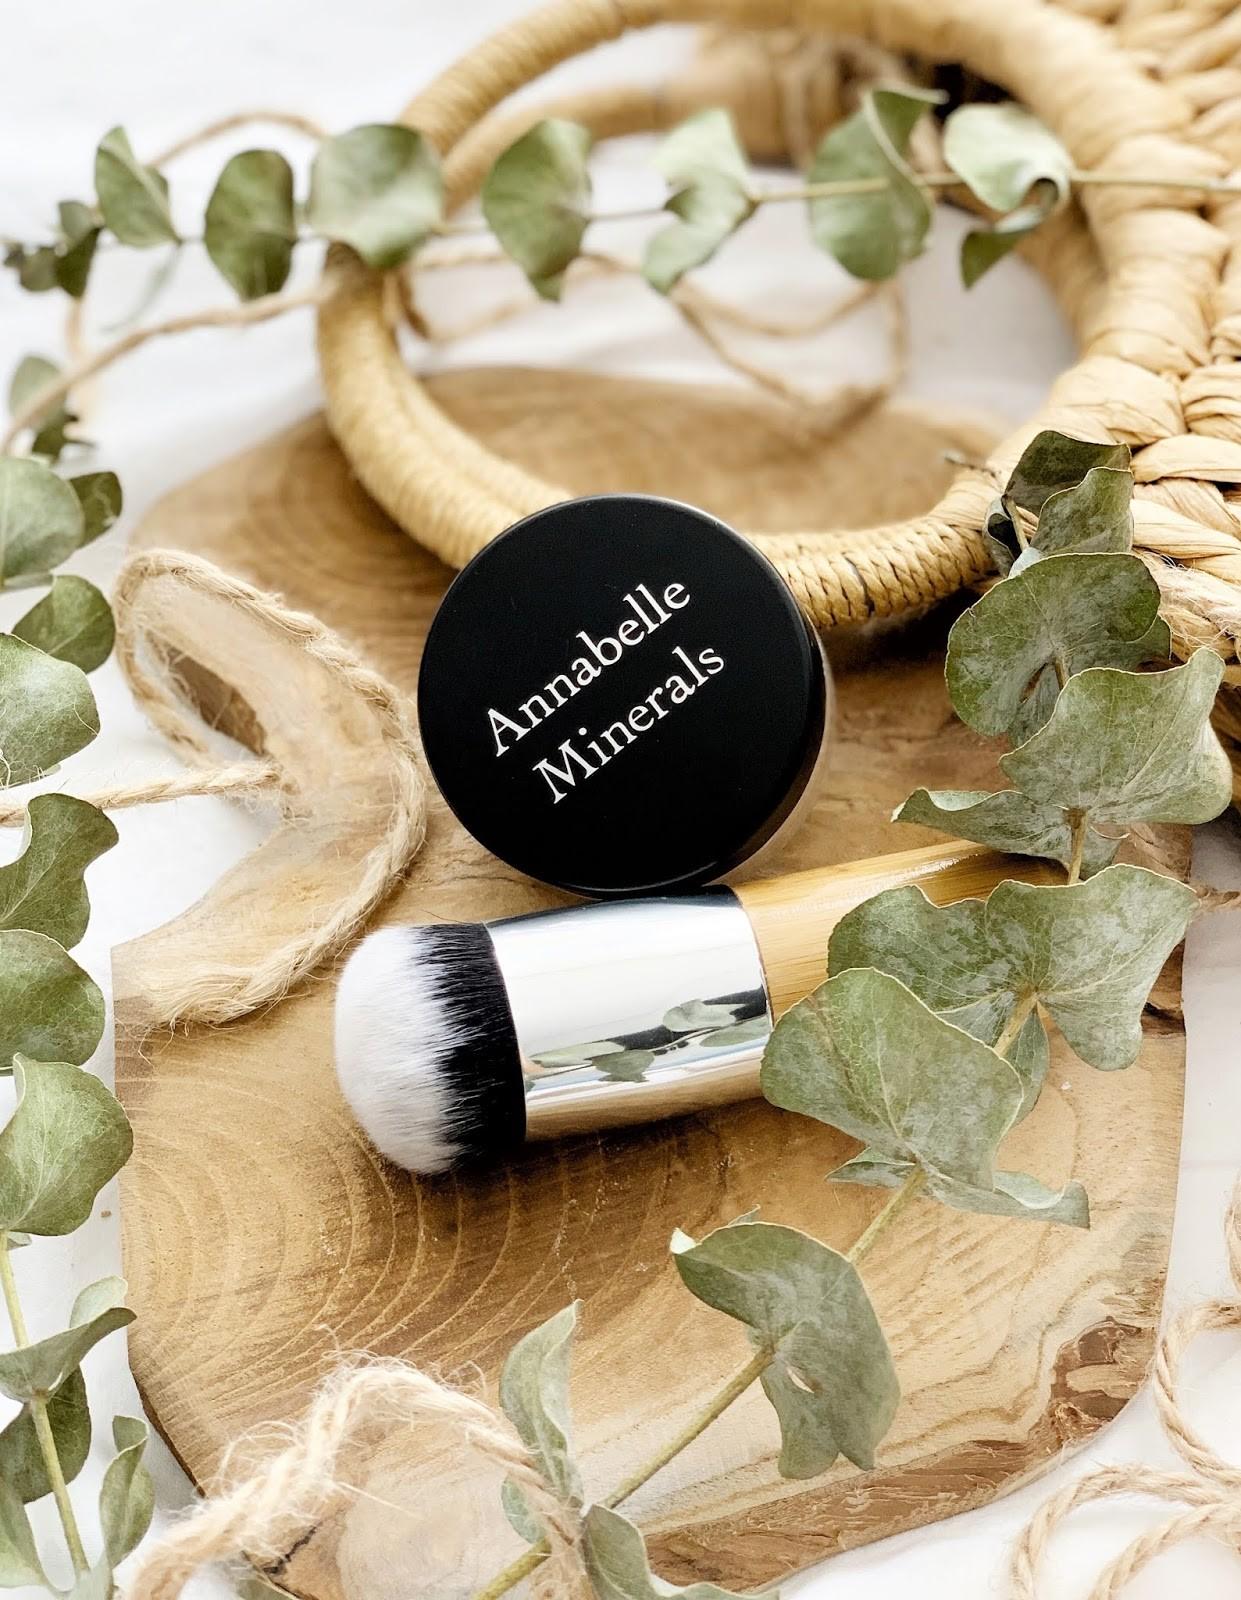 Podkład matujący Annabelle Minerals - recenzja